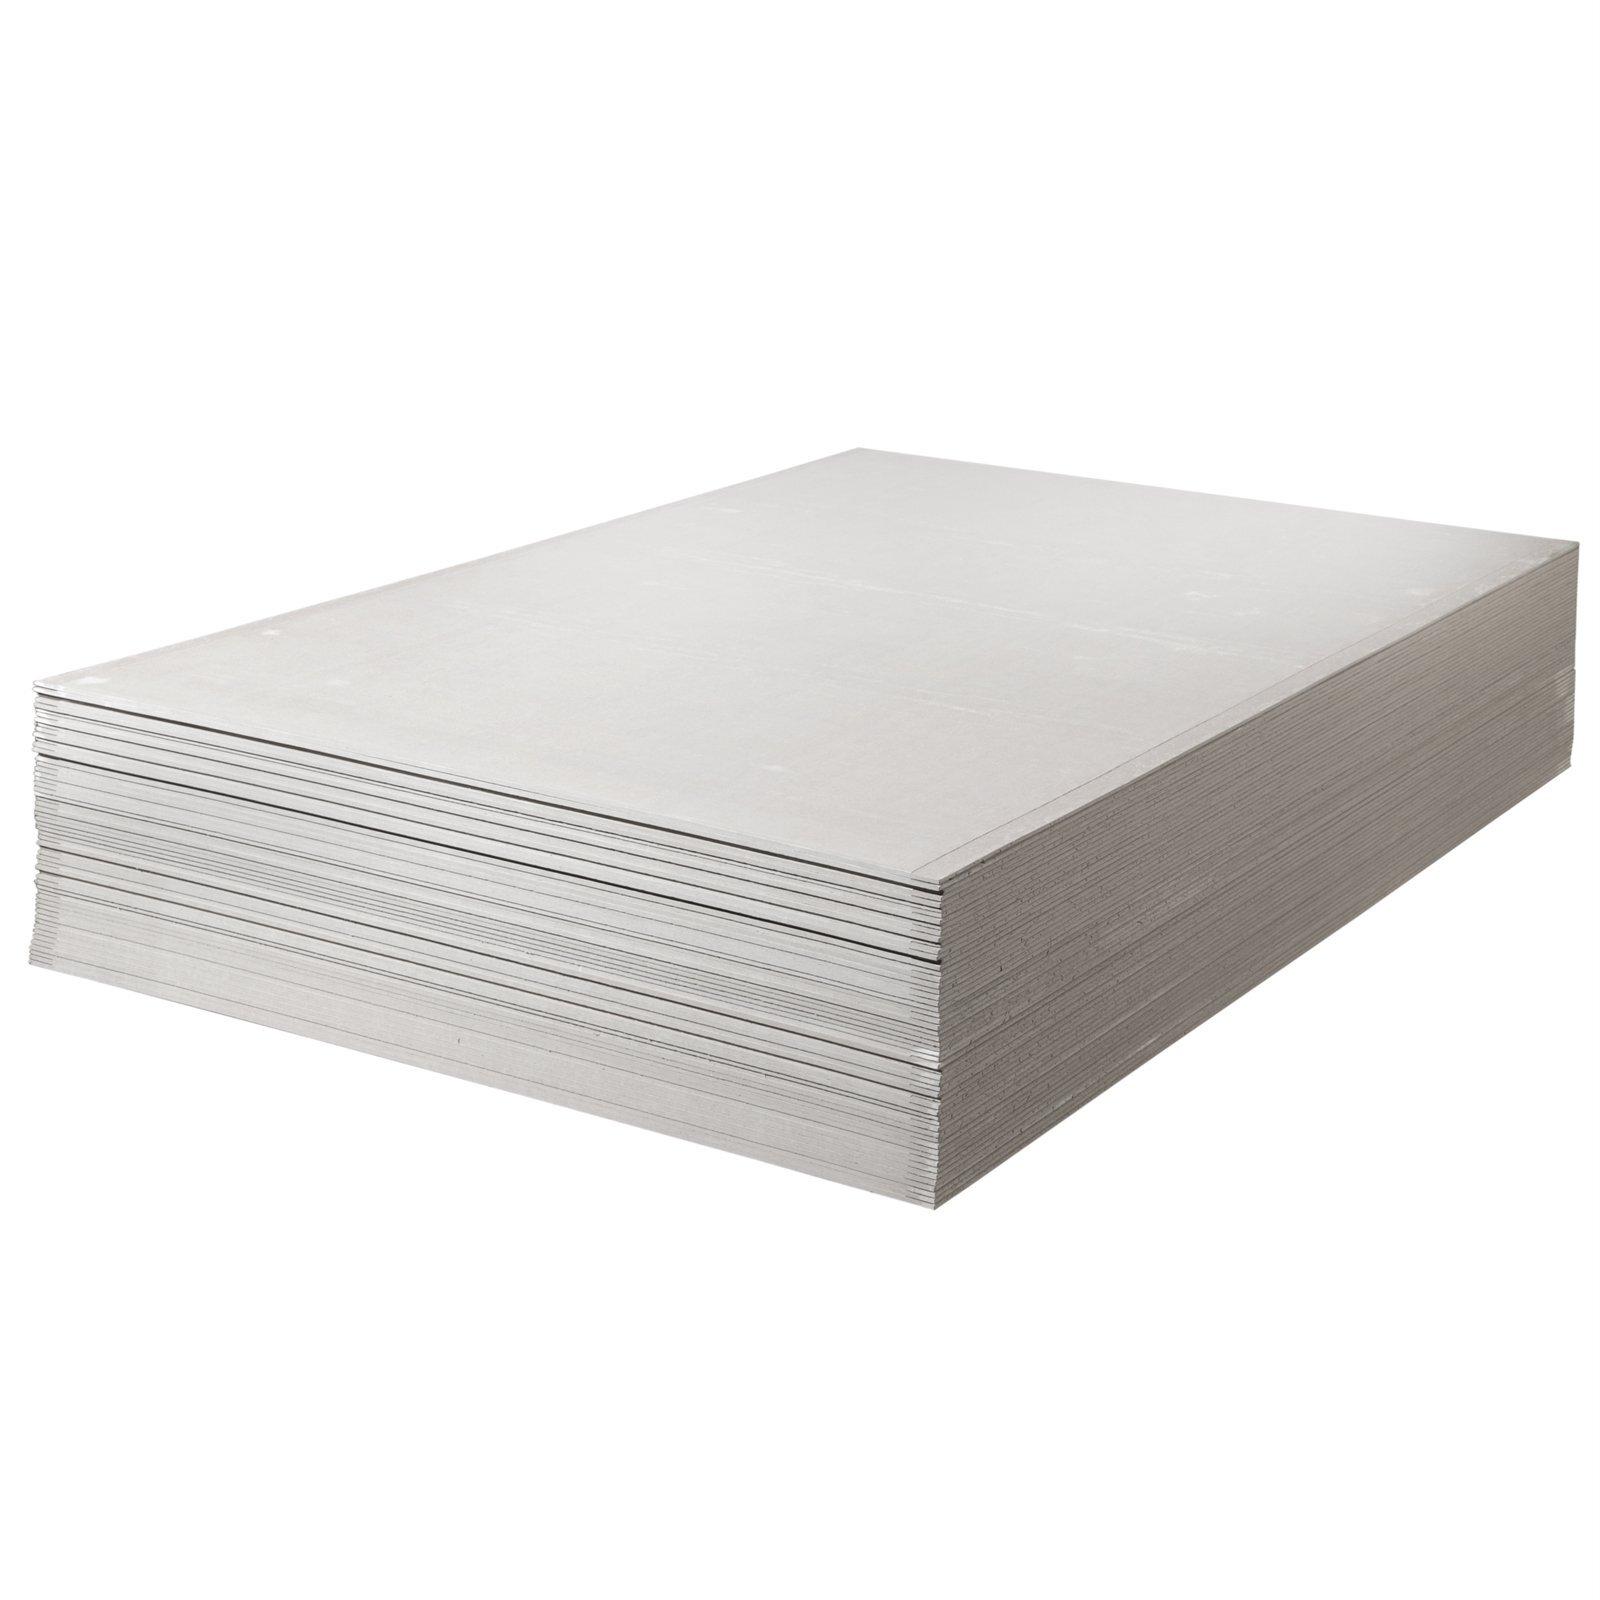 James Hardie 2400 x 1200 x 6mm 2.88m² Villaboard Lining